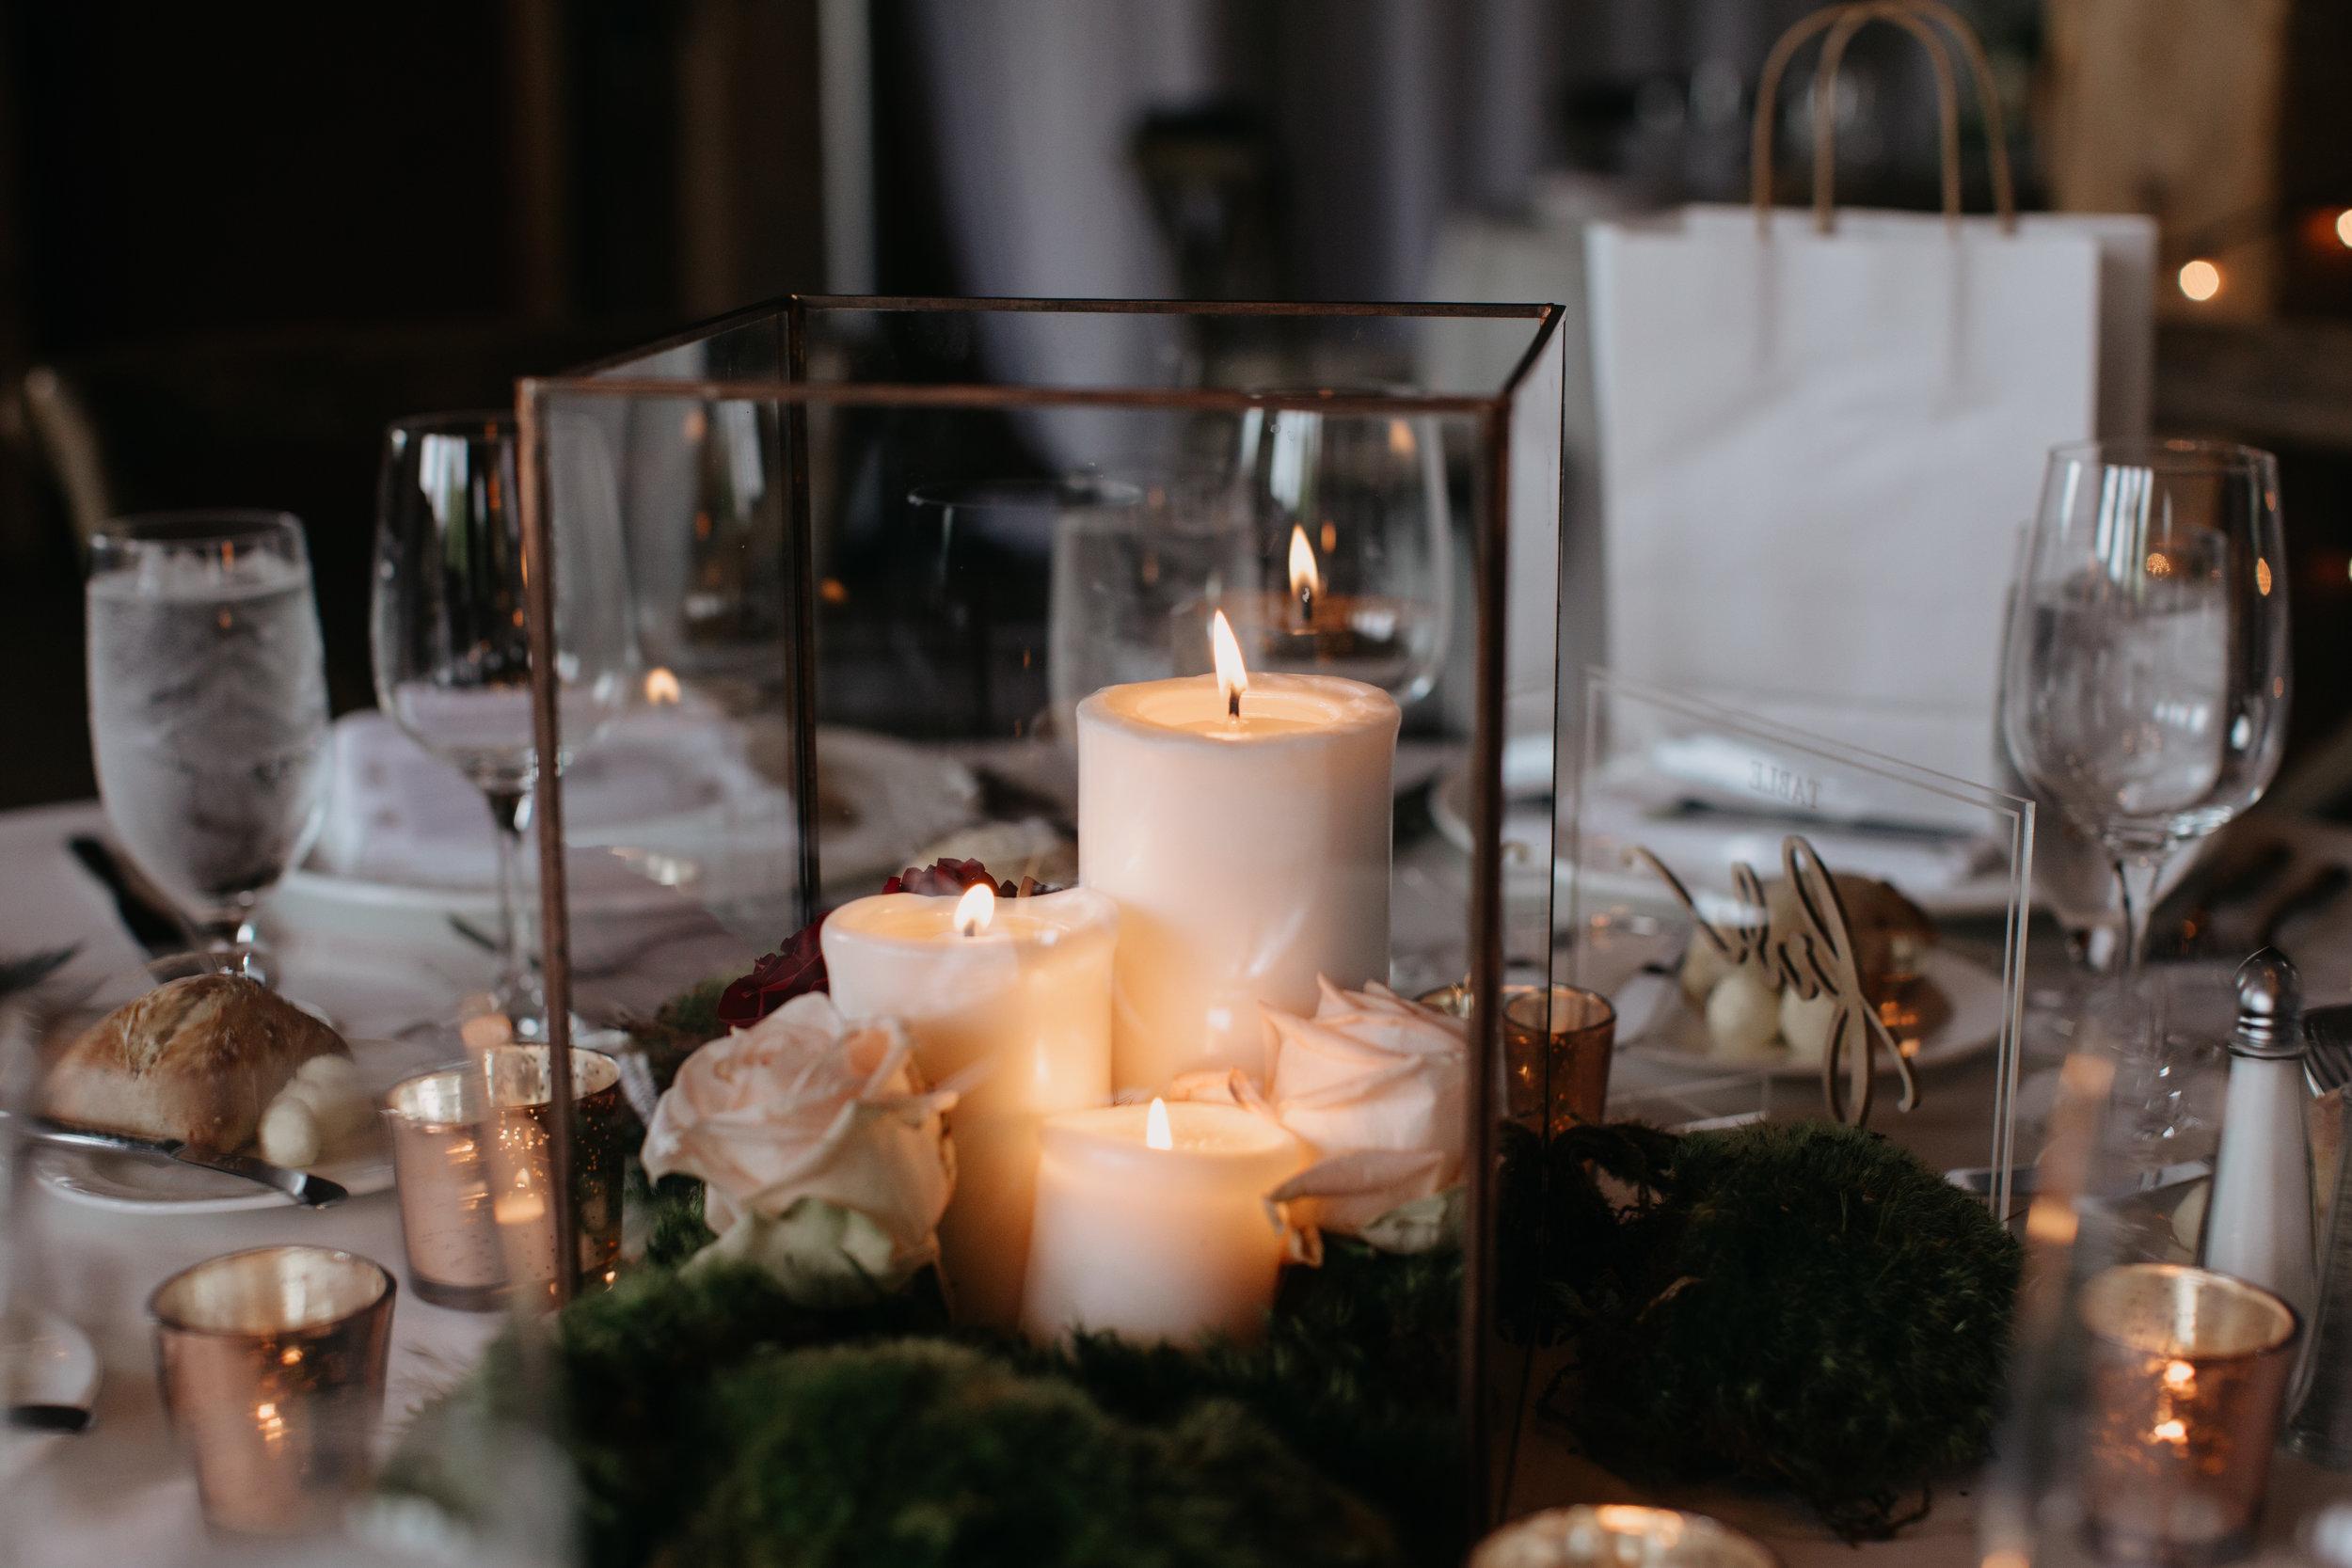 claudia & will wedding details instagram-7.JPG